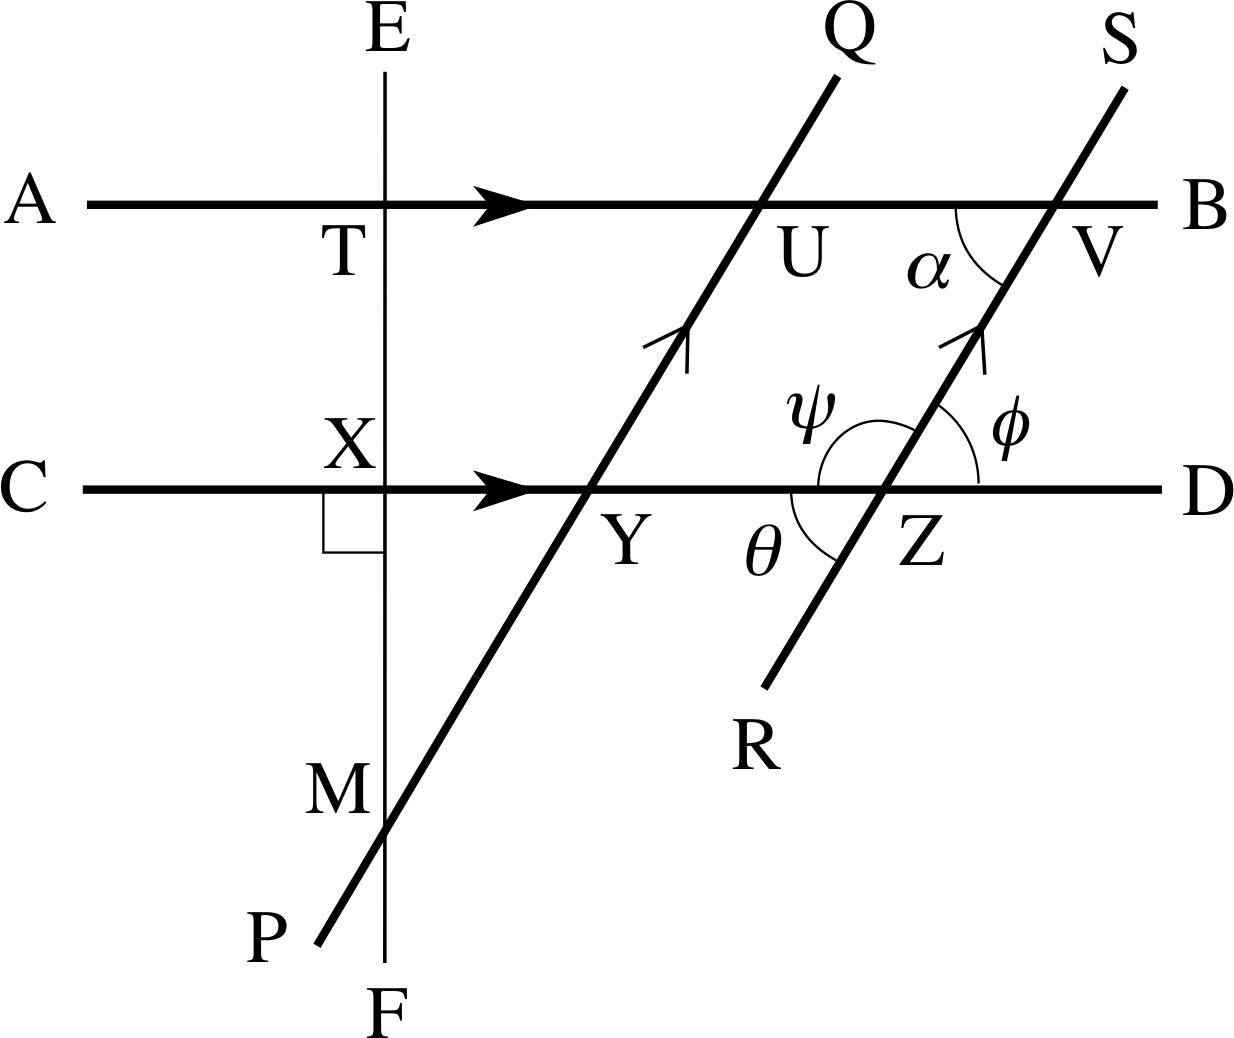 Pplato flap math 21 introducing geometry figure biocorpaavc